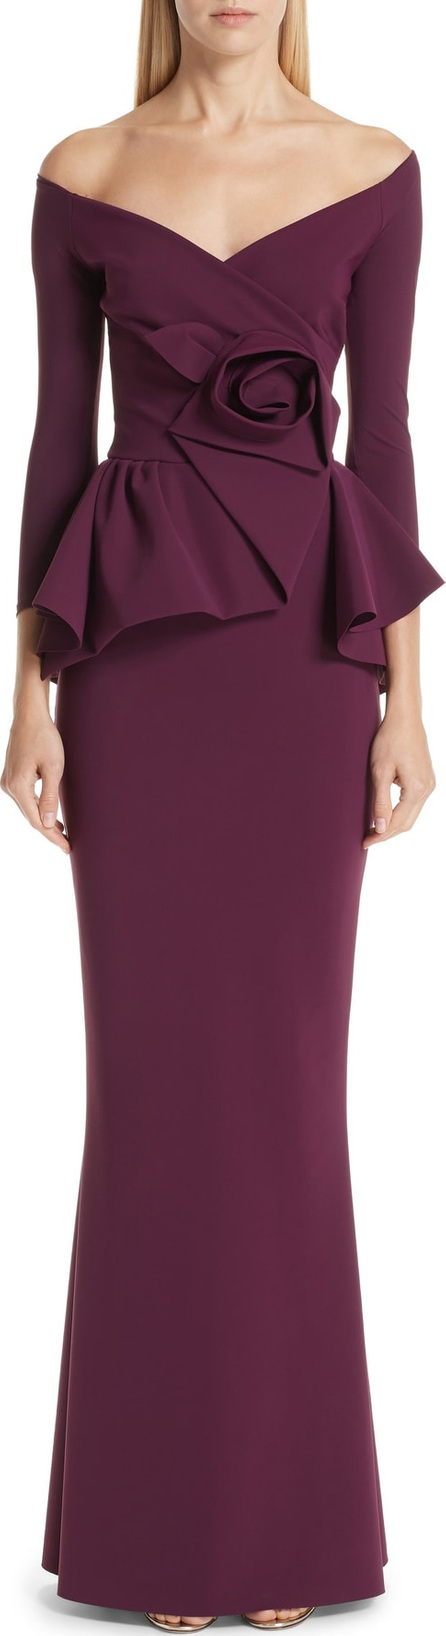 La Petite Robe di Chiara Boni Almunda Off the Shoulder Peplum Gown